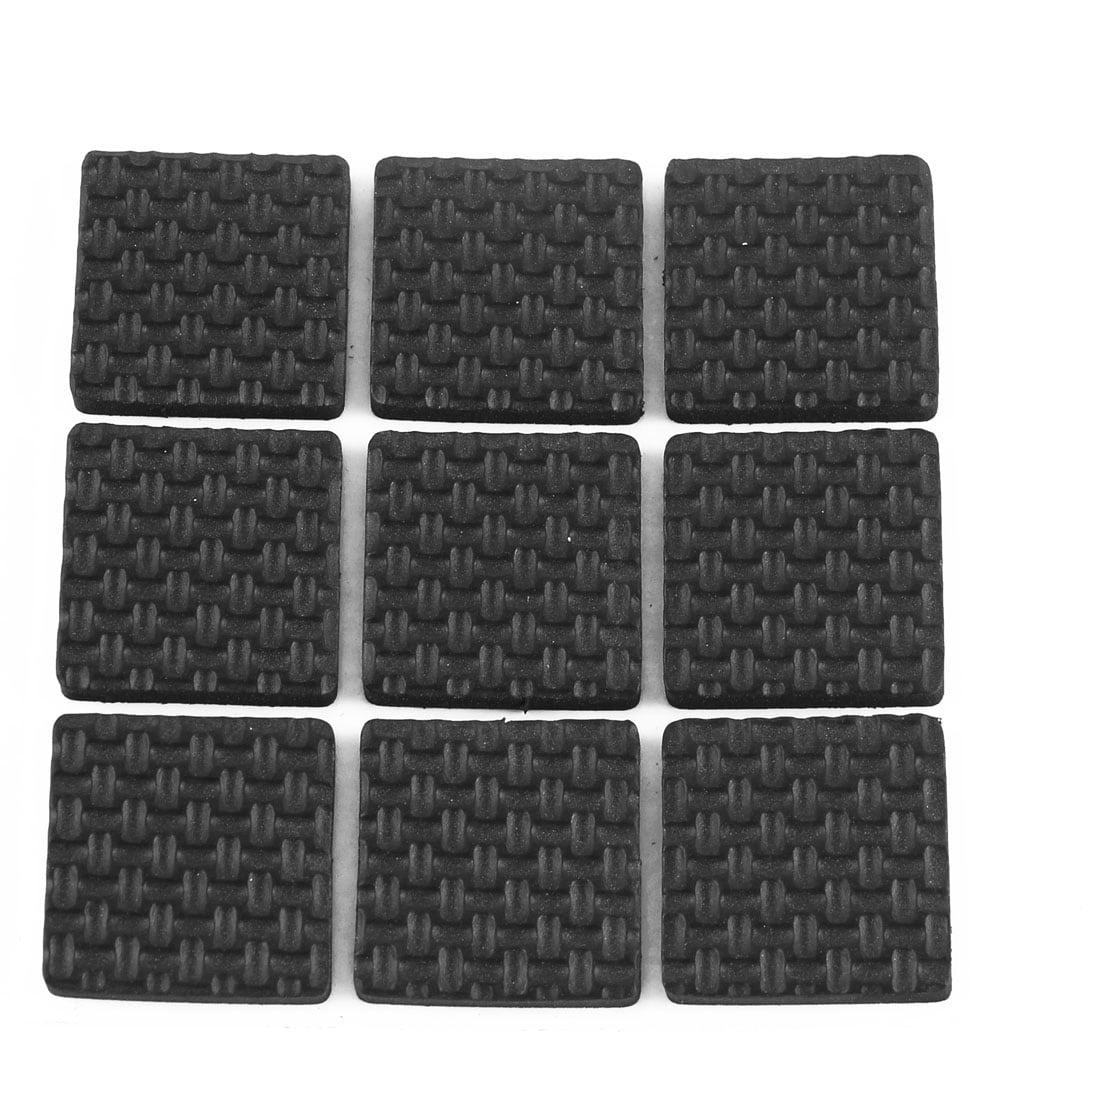 9pcs 25mm Square Self Adhesive Chair